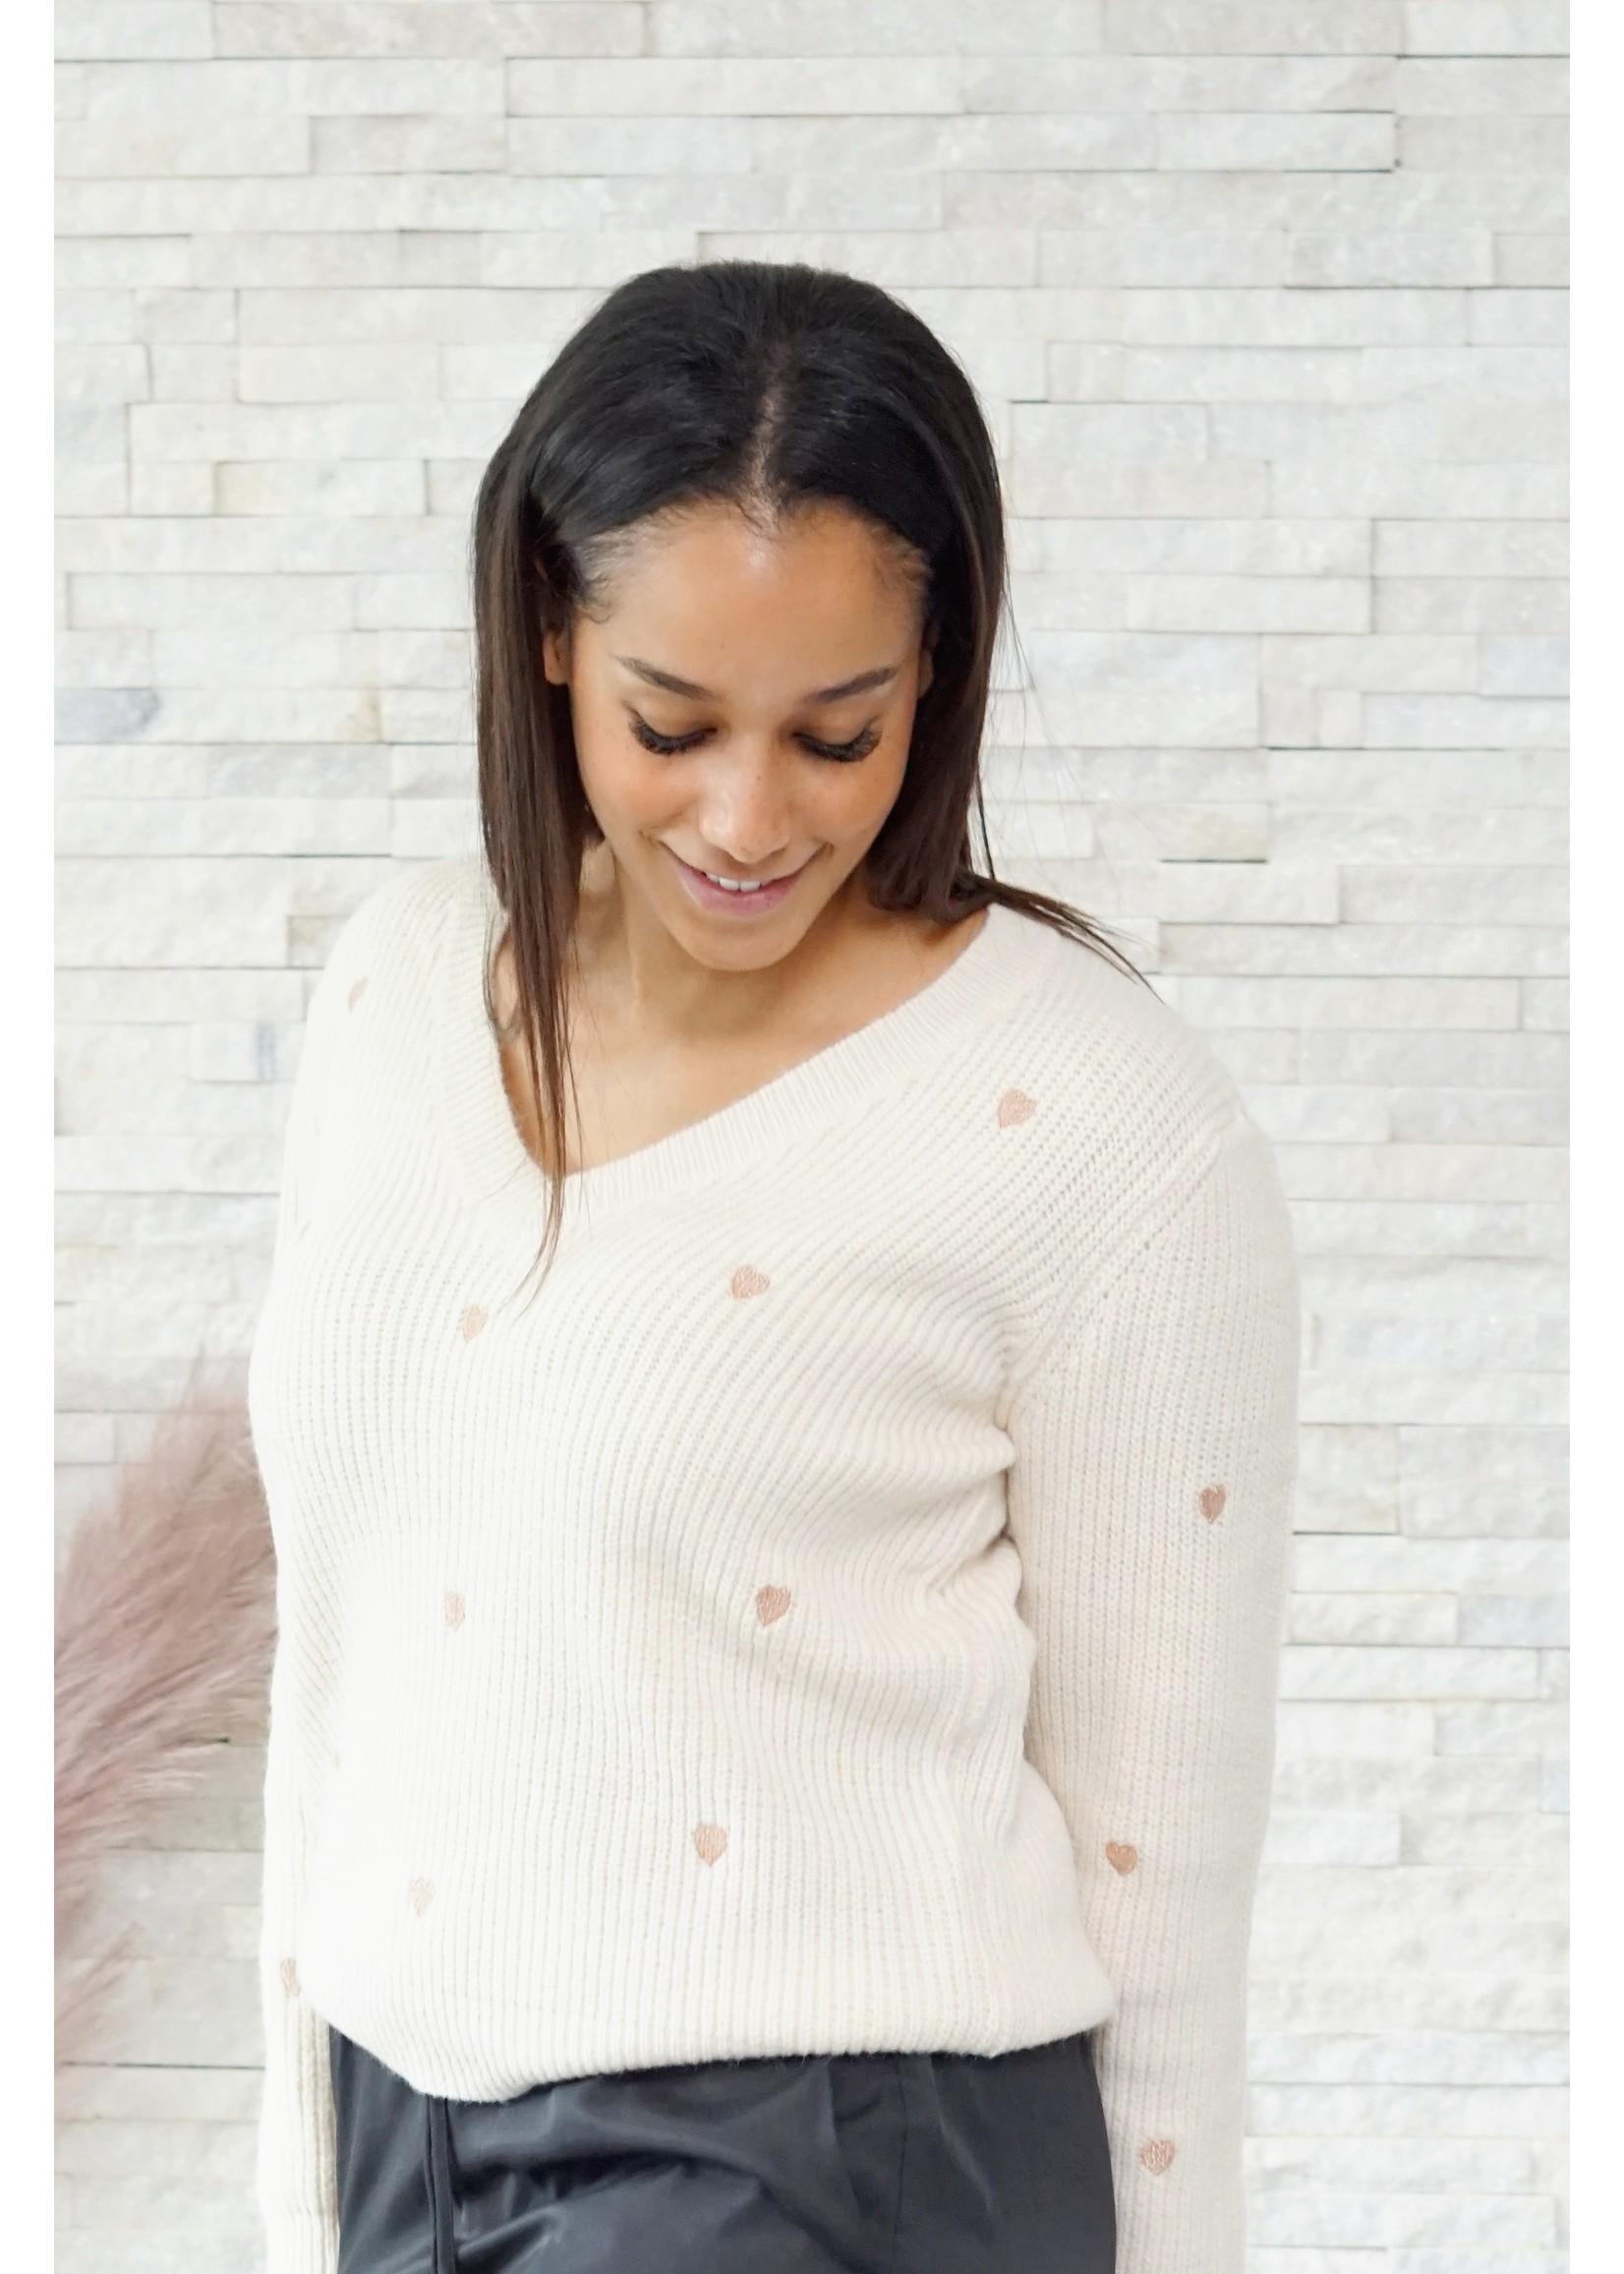 Cherry Paris Officiel Love beige sweater